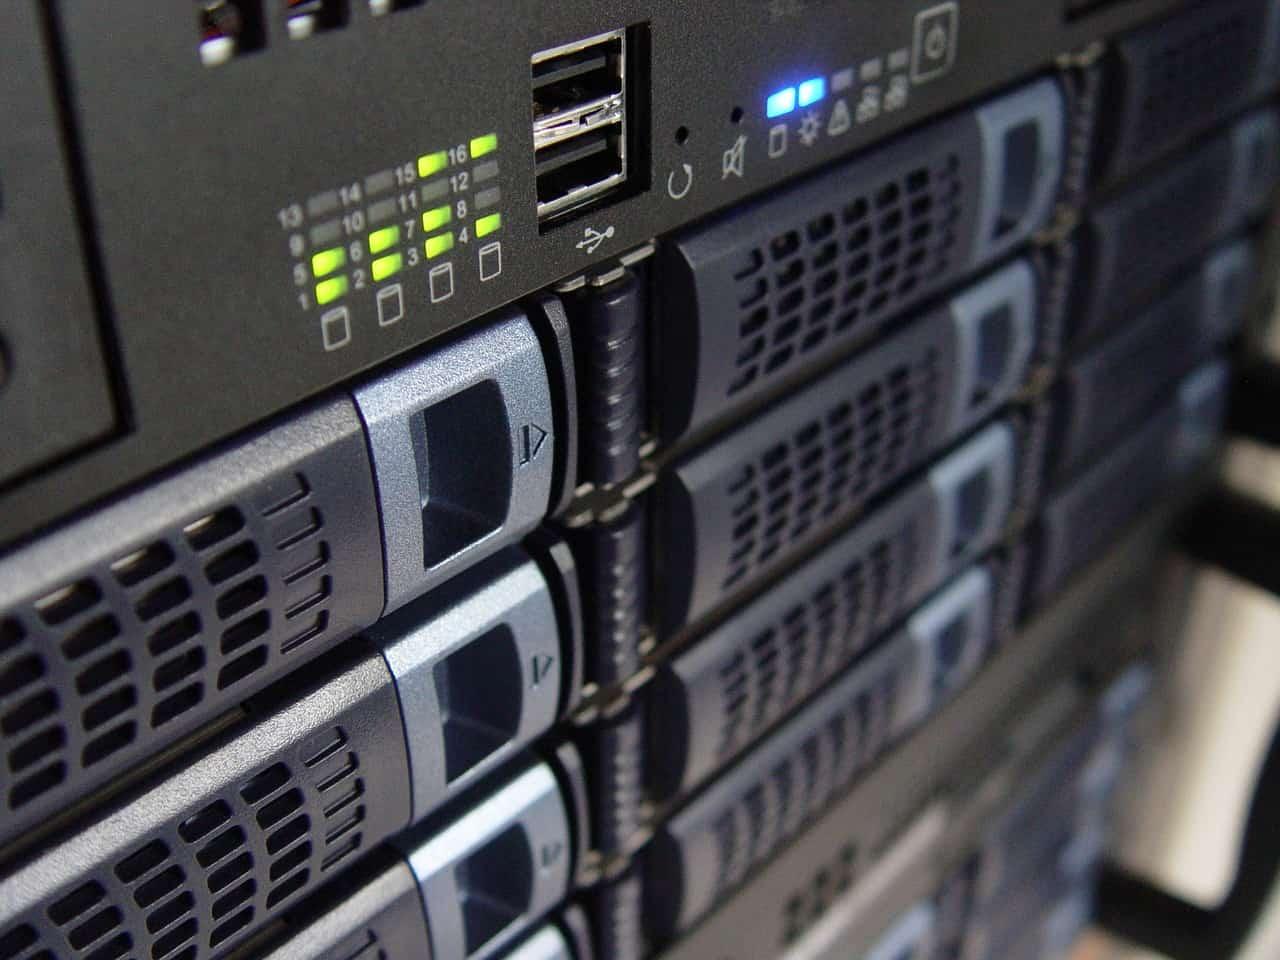 Servers in a rack